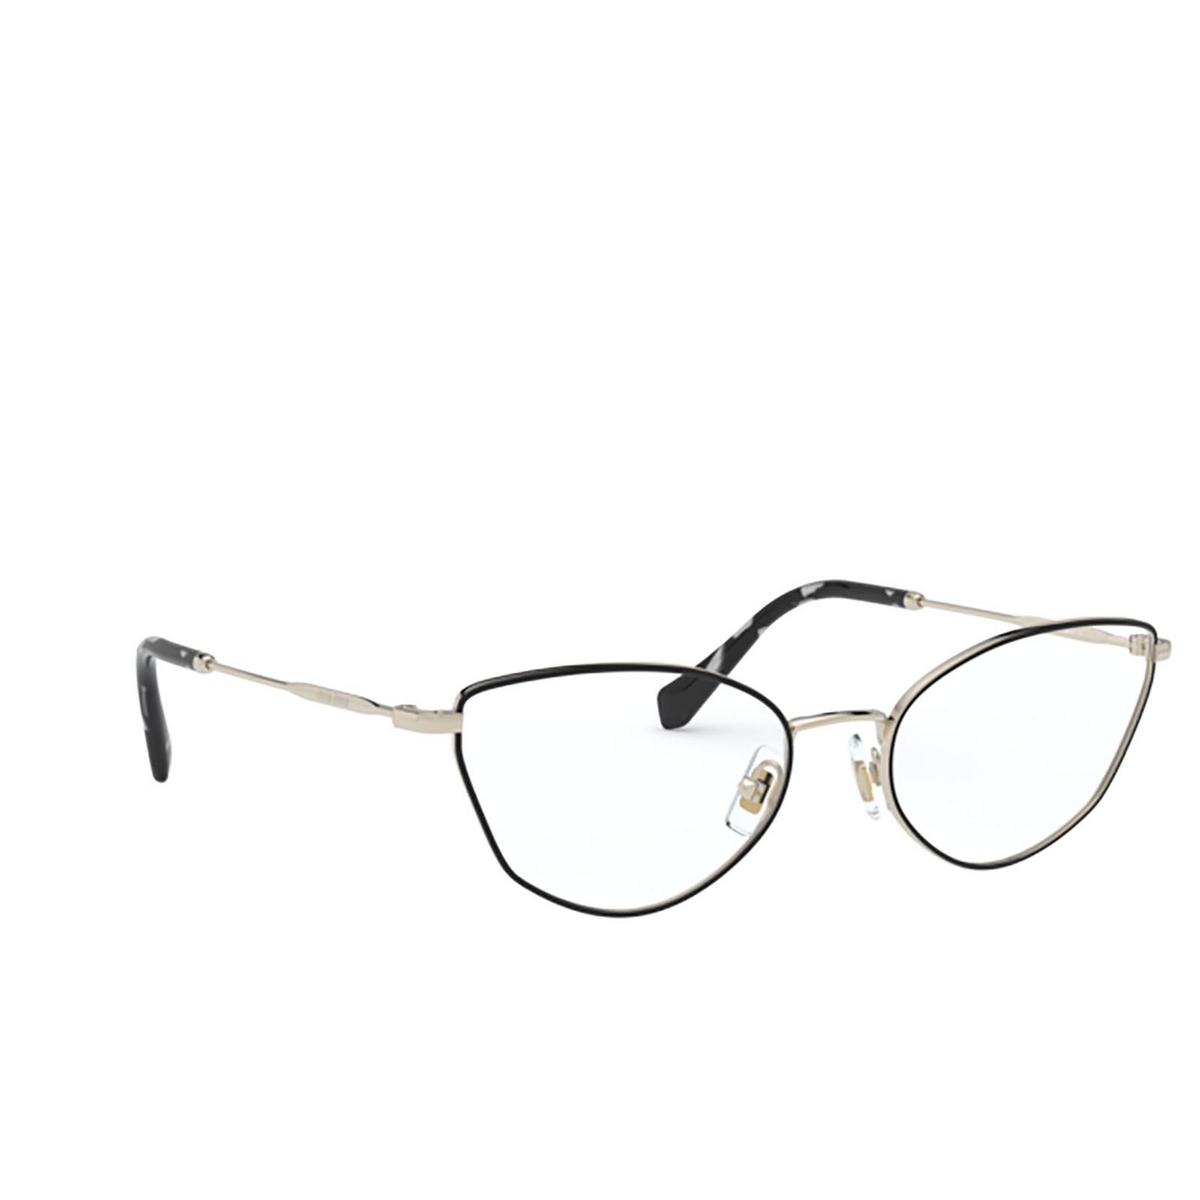 Miu Miu® Cat-eye Eyeglasses: MU 51SV color Pale Gold / Black AAV1O1 - three-quarters view.